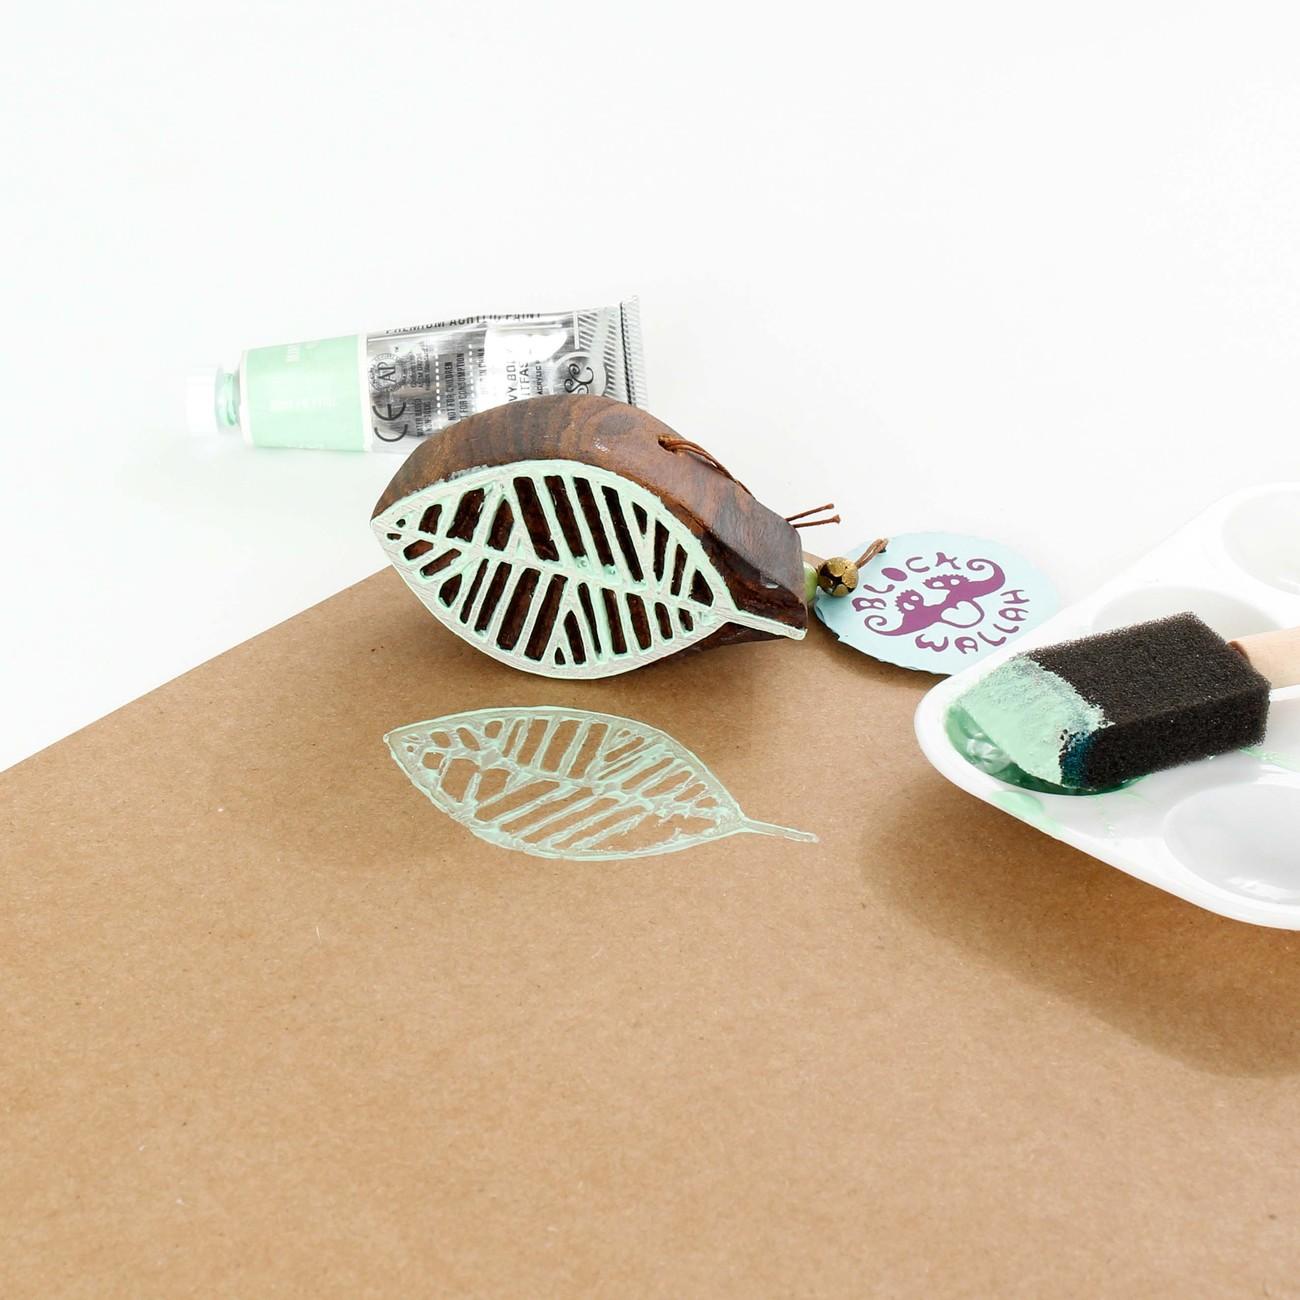 Picture 4 of WINK WINK Scrapbook Kit